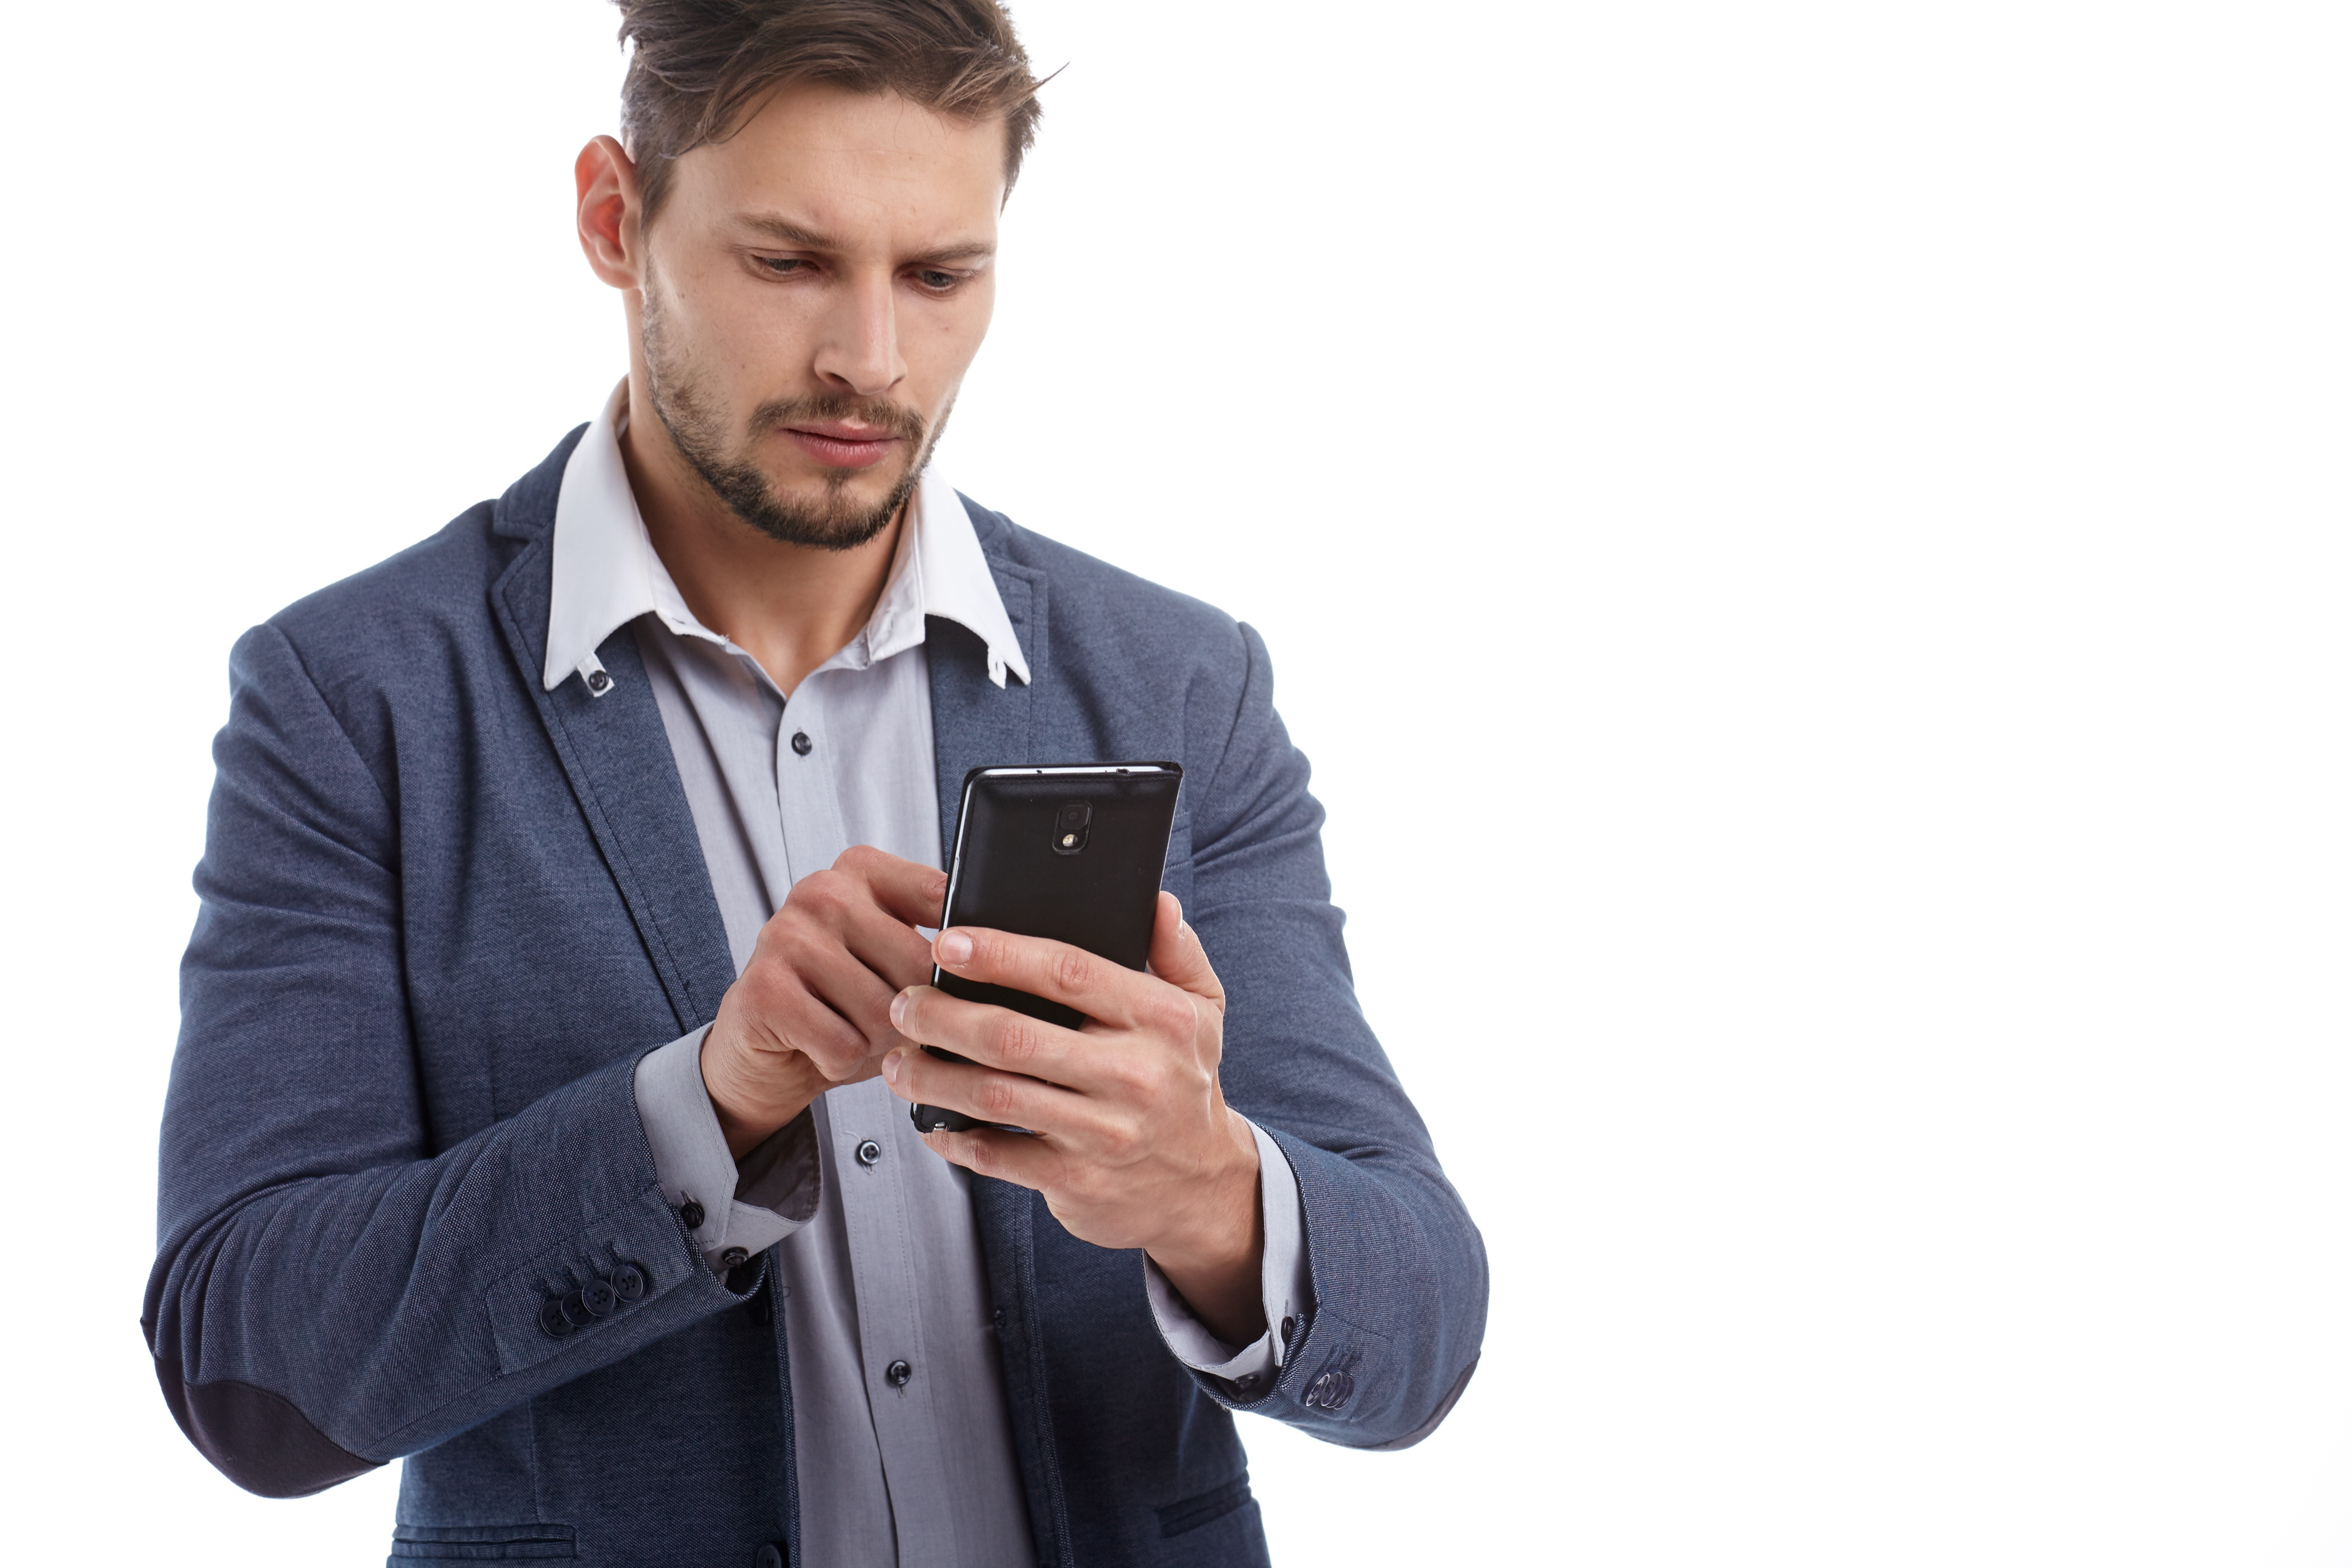 man_texting